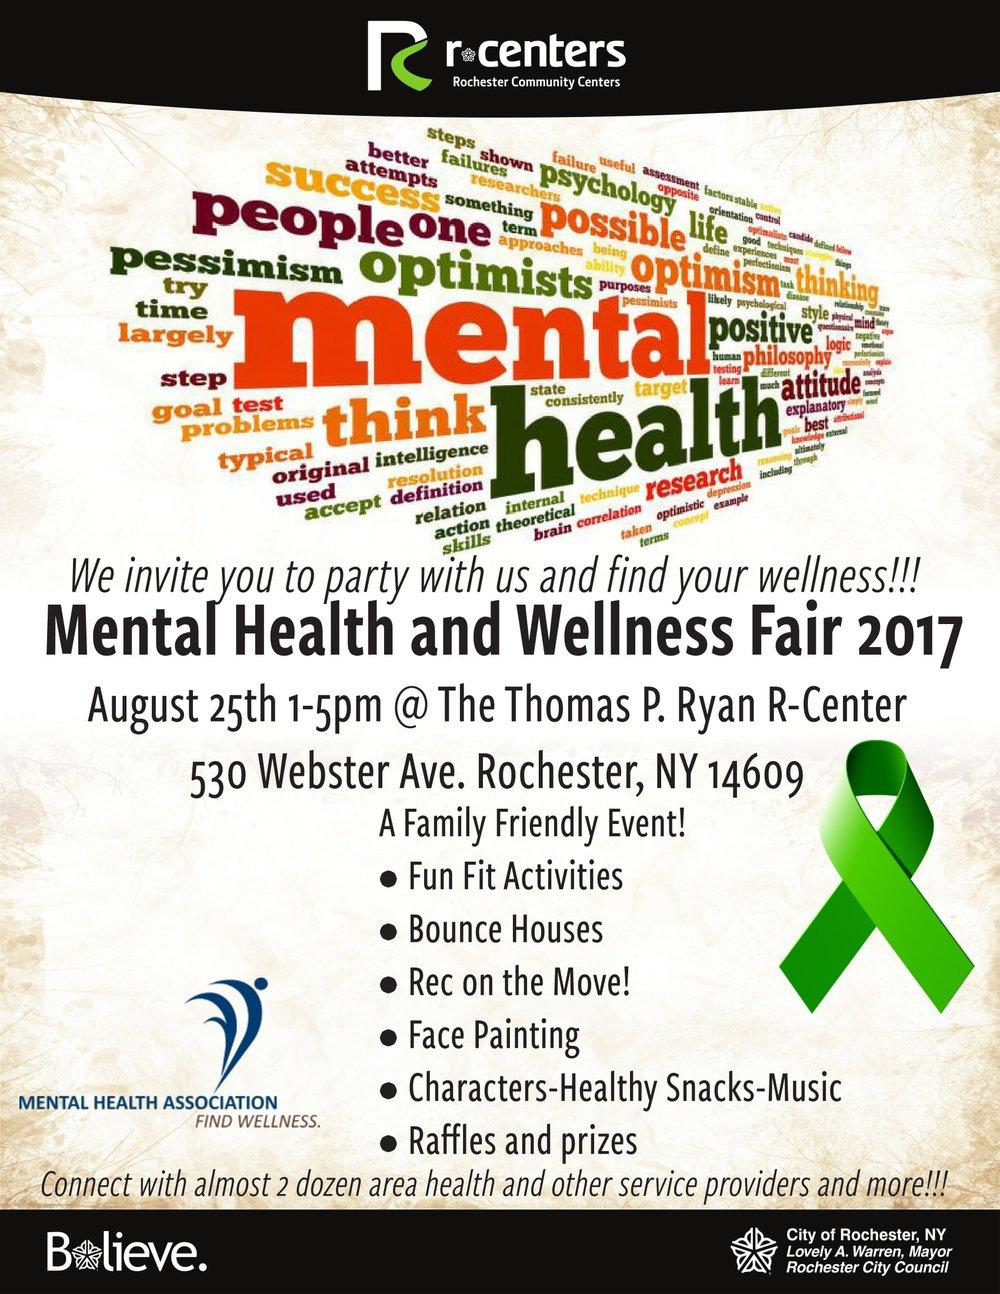 MentalHealthFair2017-1.jpg